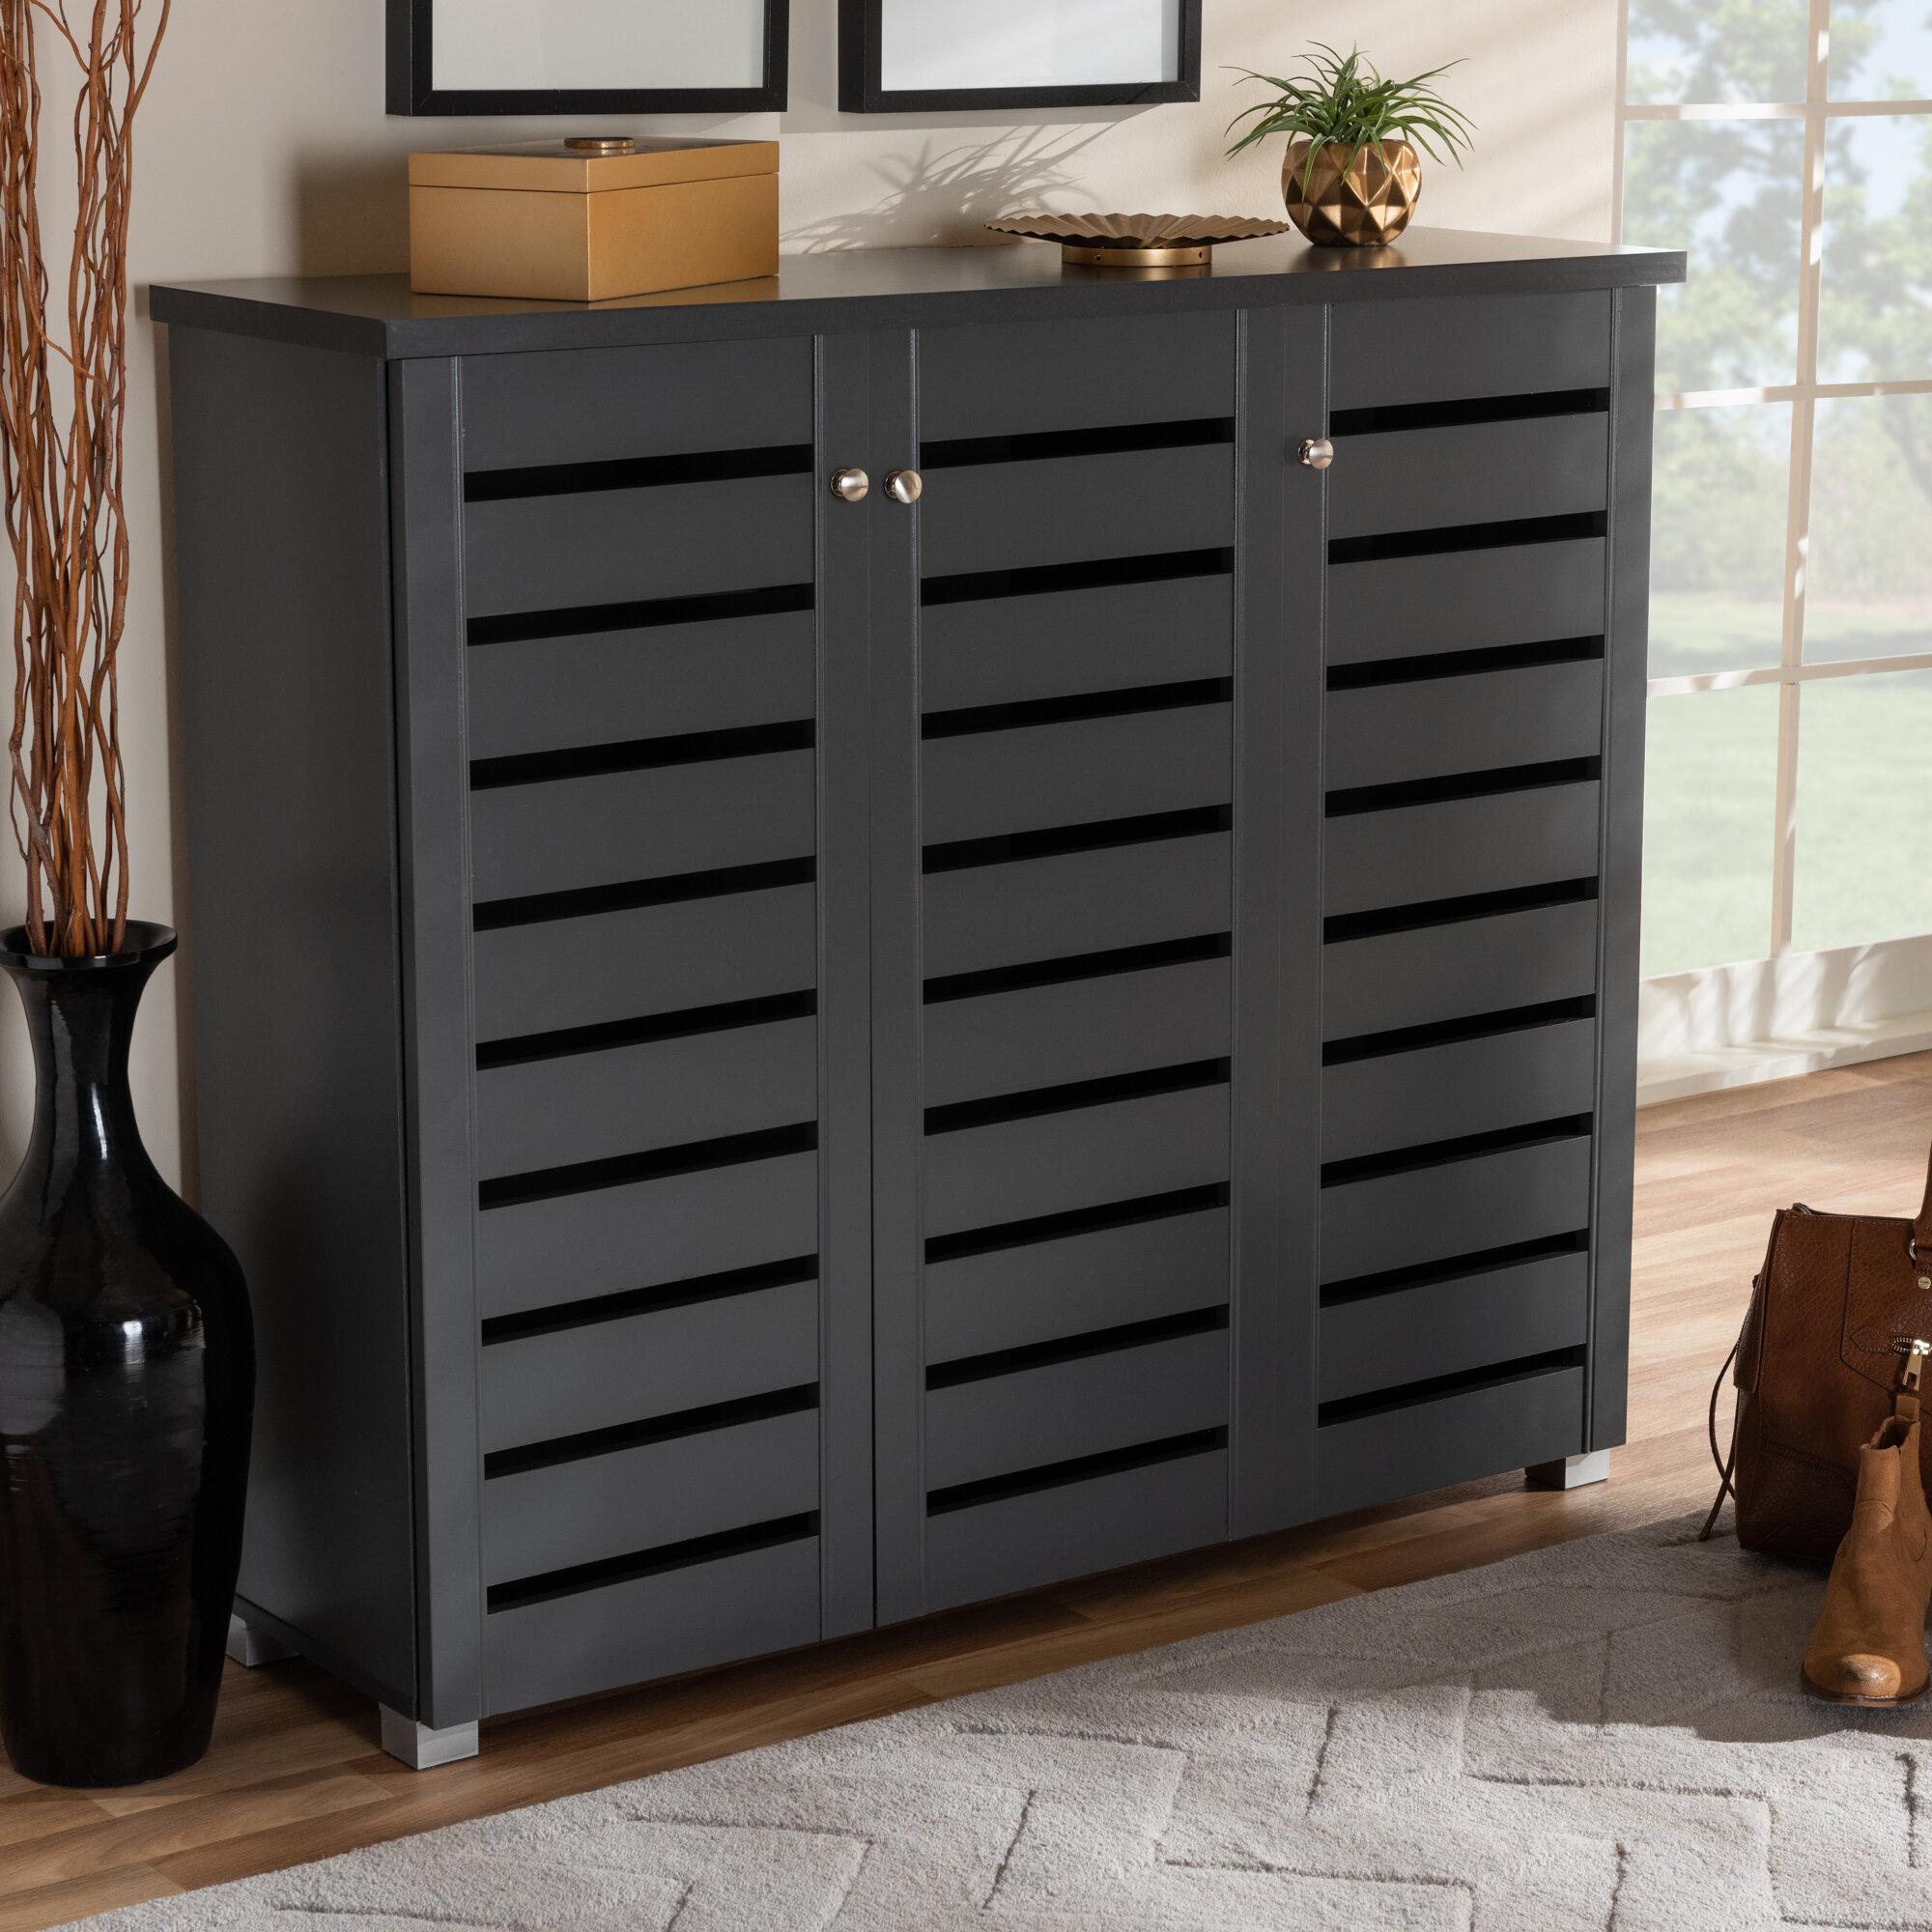 Delicieux Rebrilliant Entryway 20 Pair Shoe Storage Cabinet | Wayfair